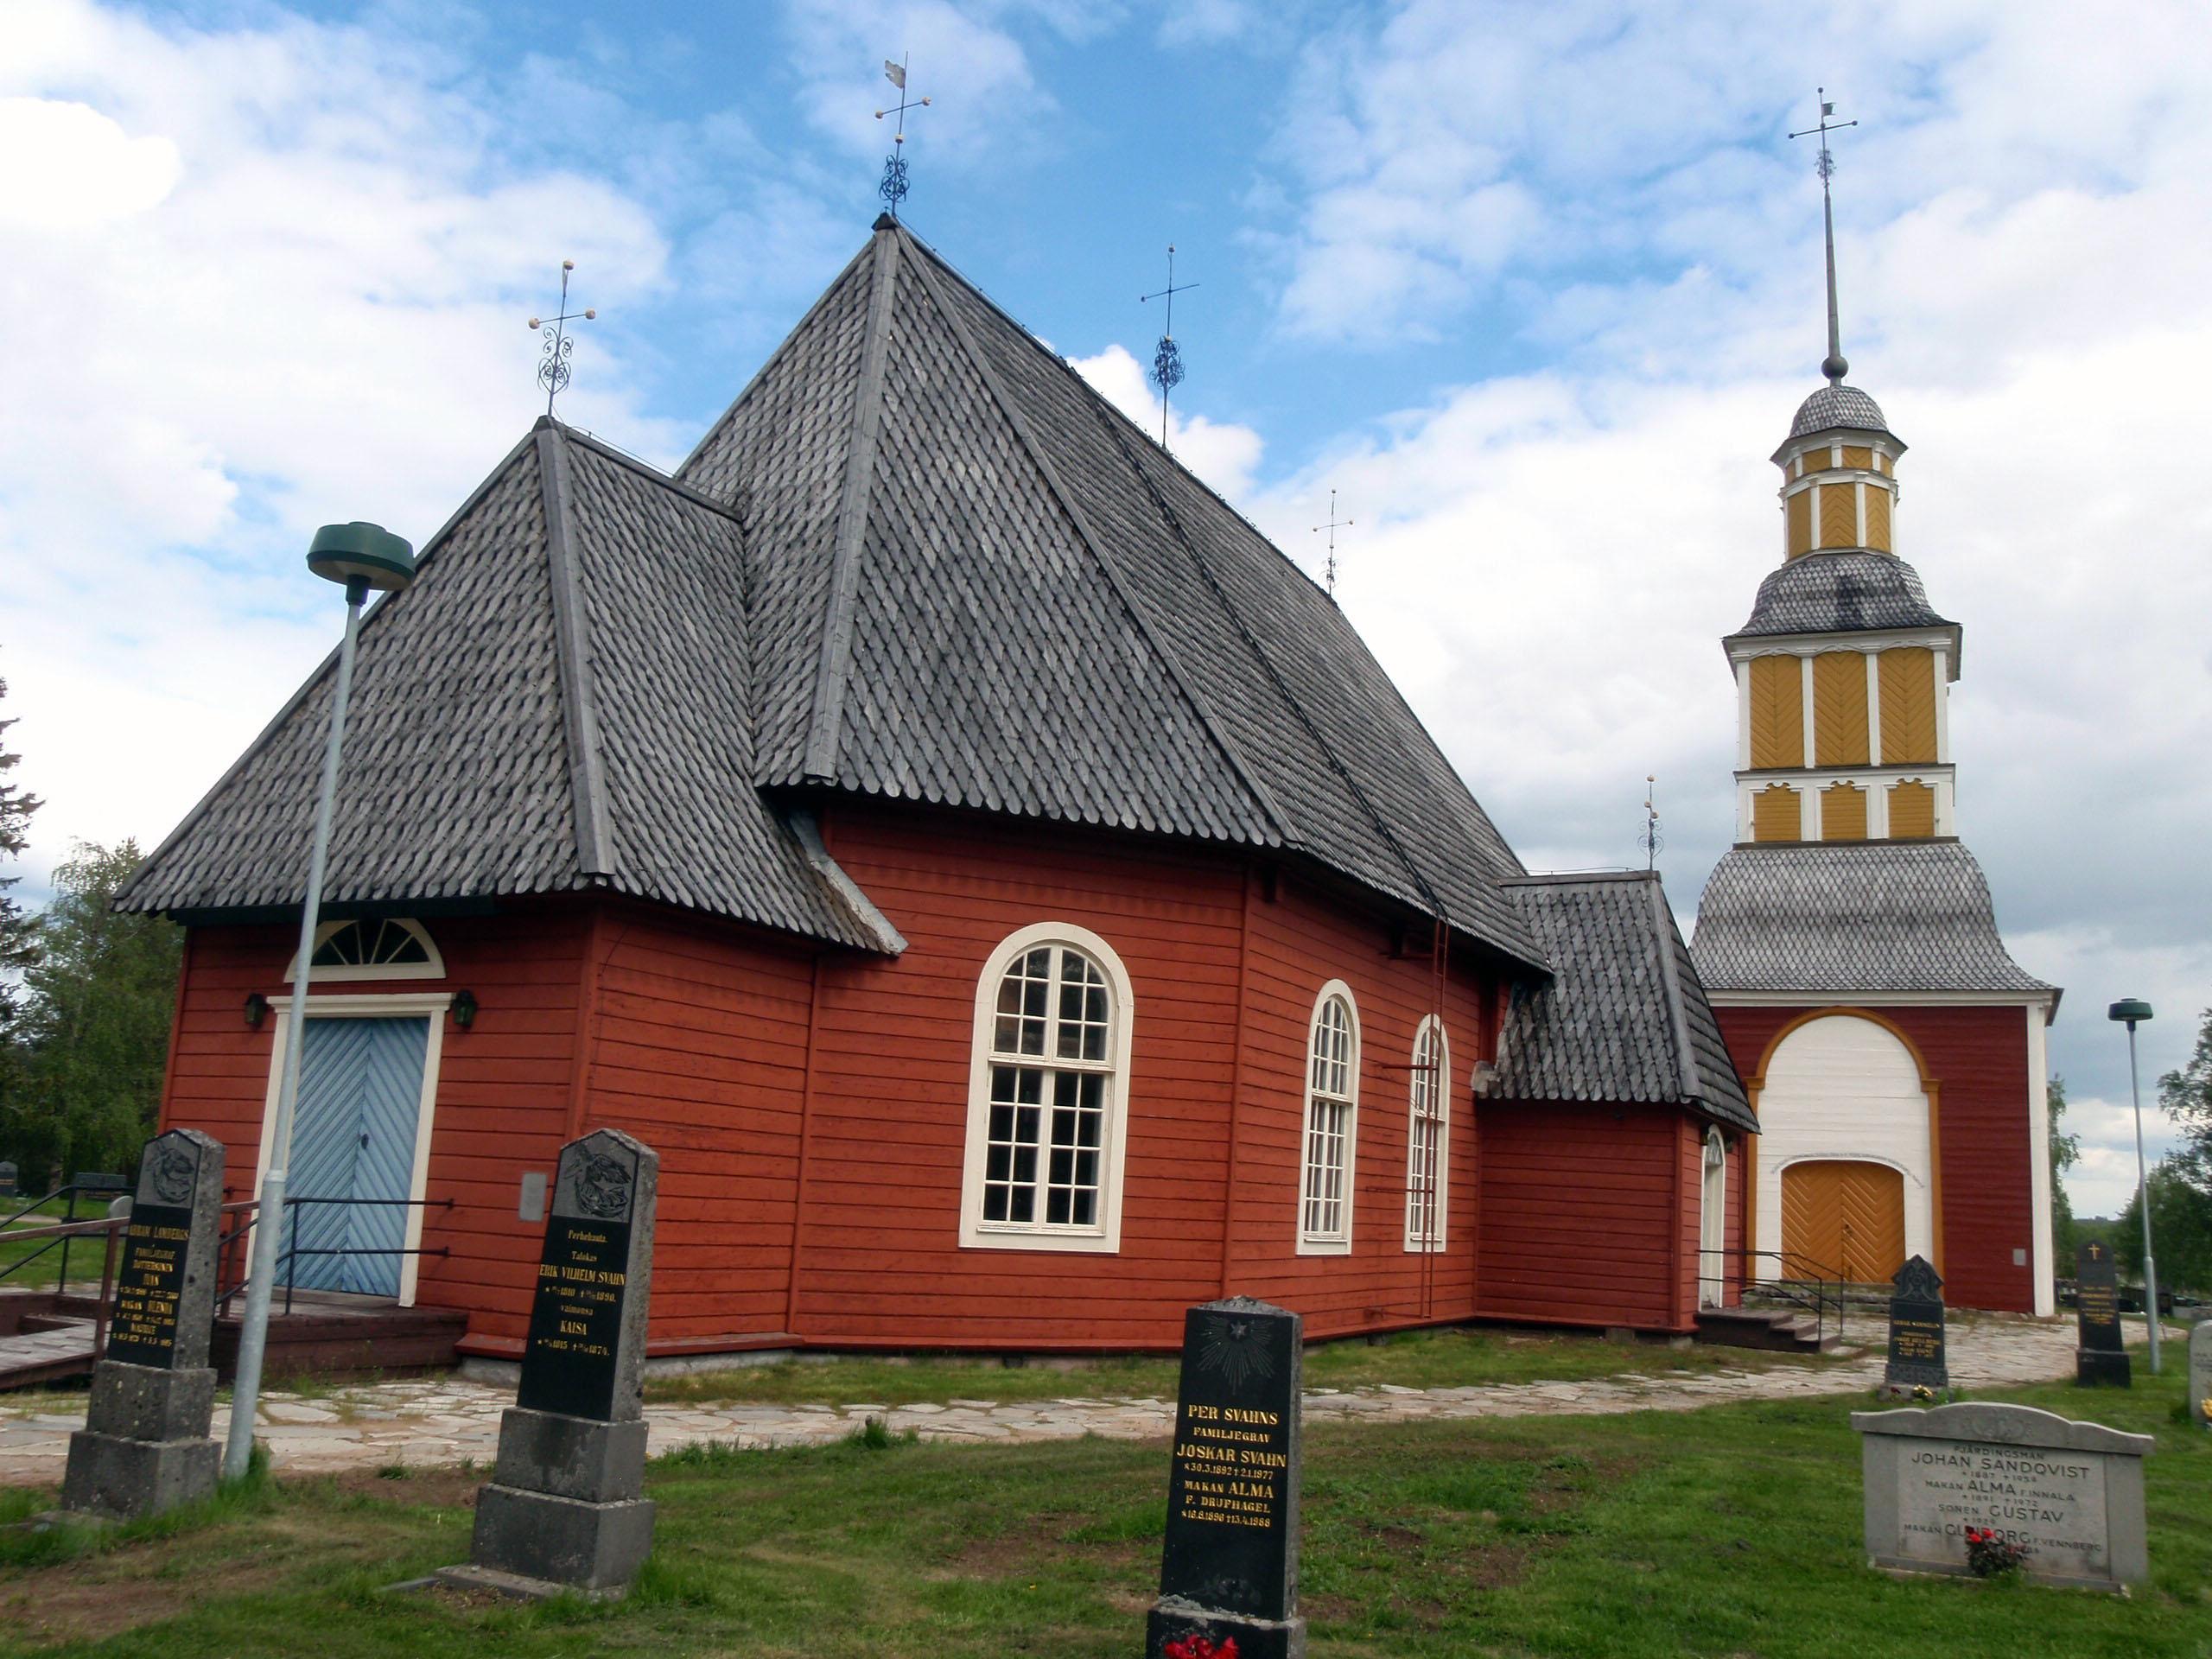 Arrangerer slektsforskningstur til Tornedalen